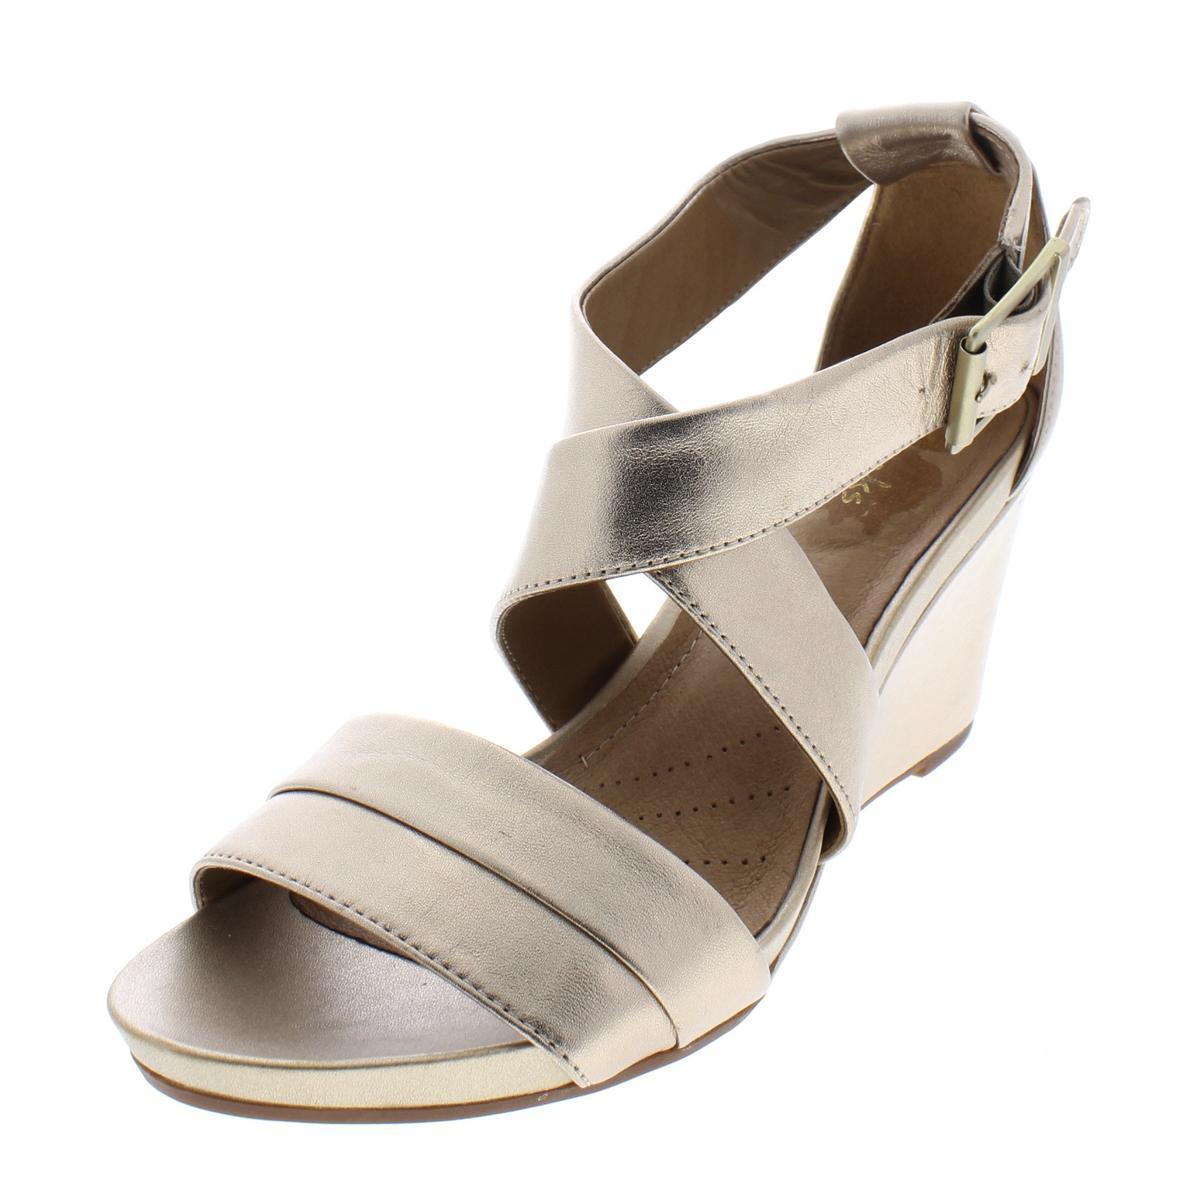 e036bd18168 Details about Clarks Womens Acina Newport Gold Wedge Sandals Shoes 6.5  Medium (B